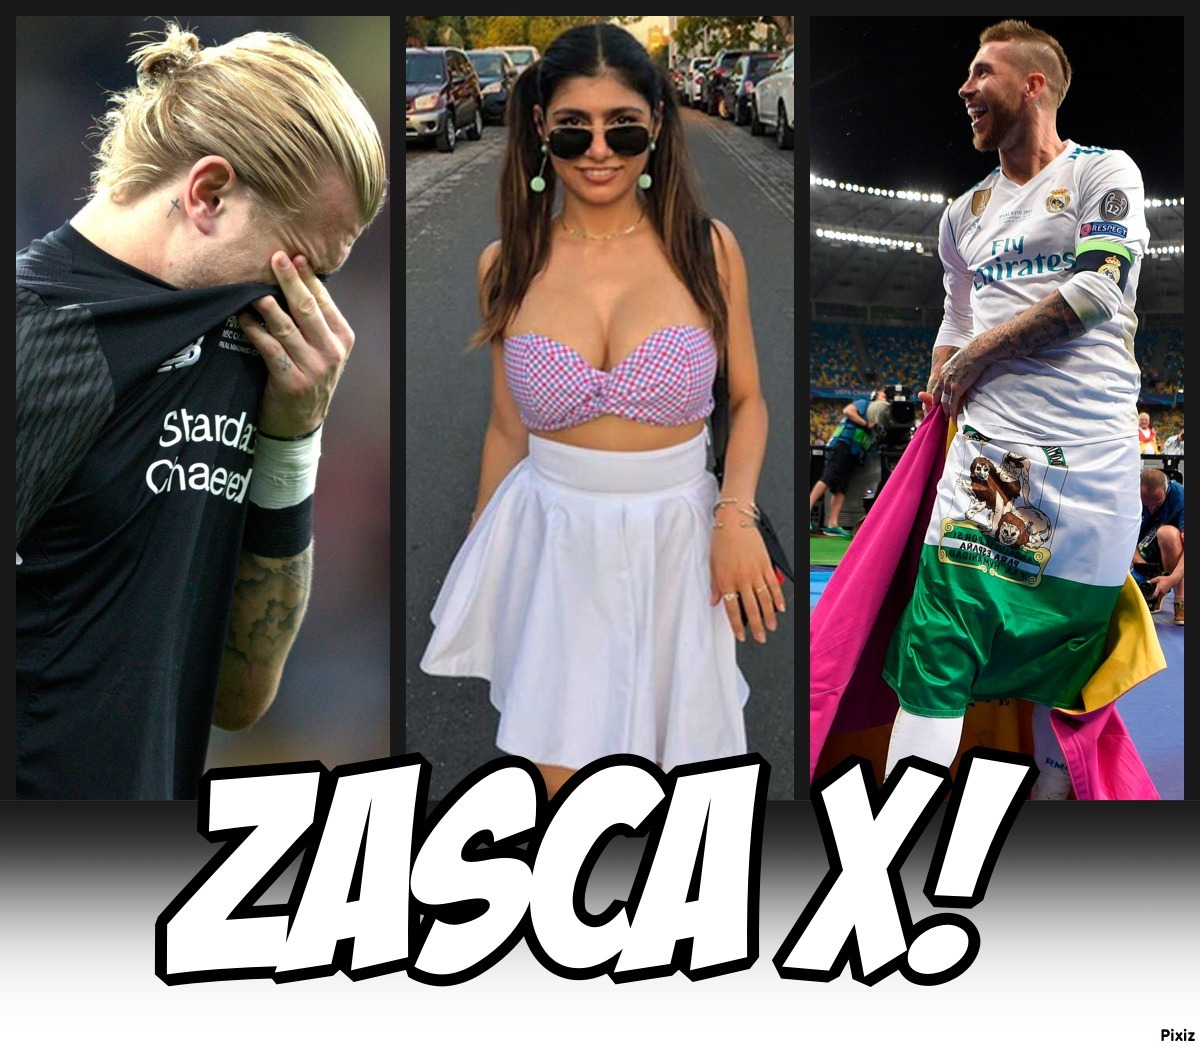 Zasca X de Mia Khalifa a Sergio Ramos para defender a Loris Karius